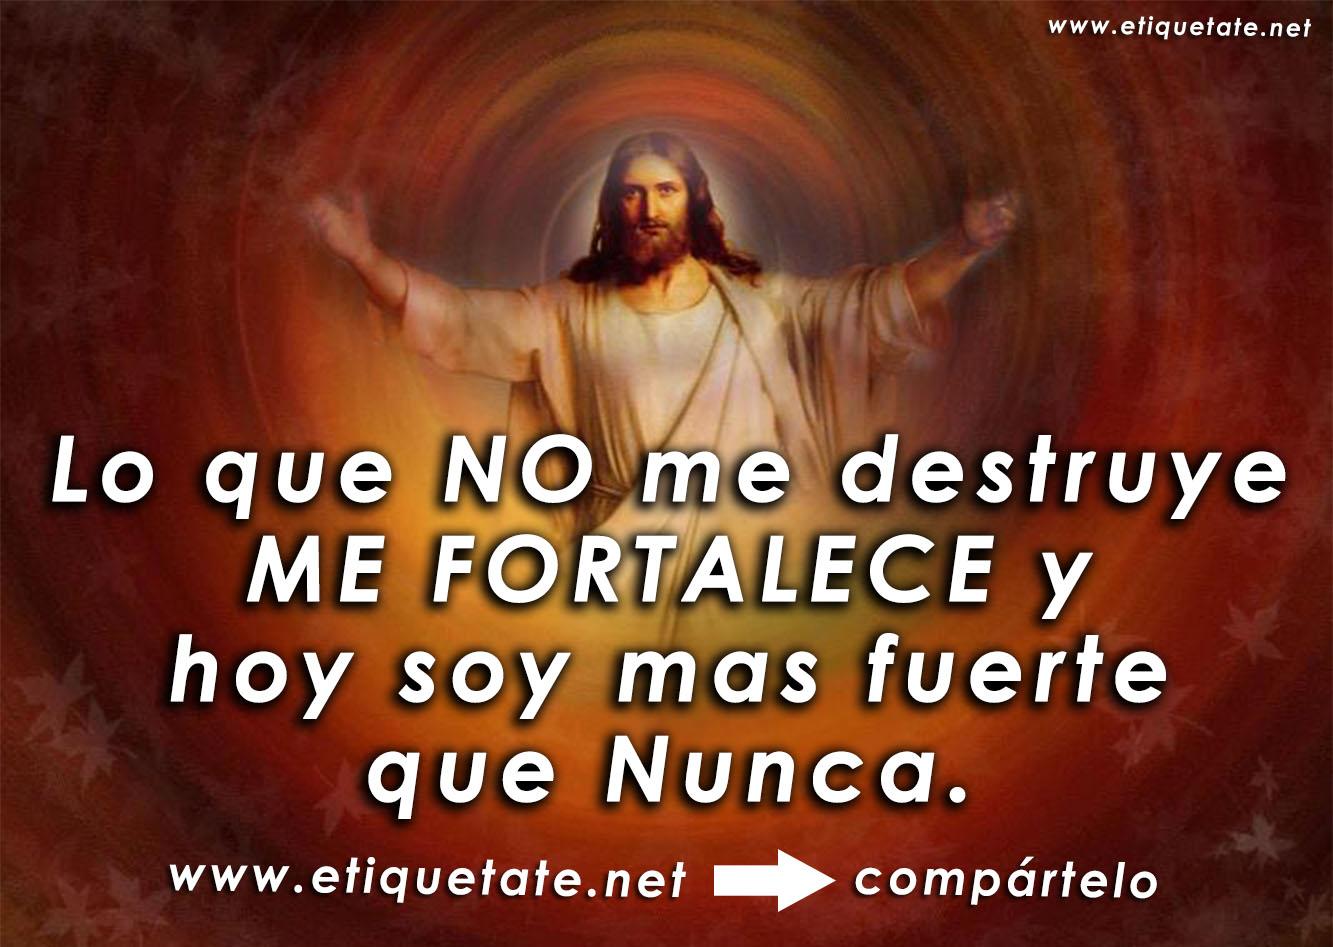 http://1.bp.blogspot.com/-2JFvoT9DJaQ/UBwYX4efWCI/AAAAAAAAEGg/eKcdqWNJatk/s1600/Mensajes+Bonitos+de+Dios.jpg